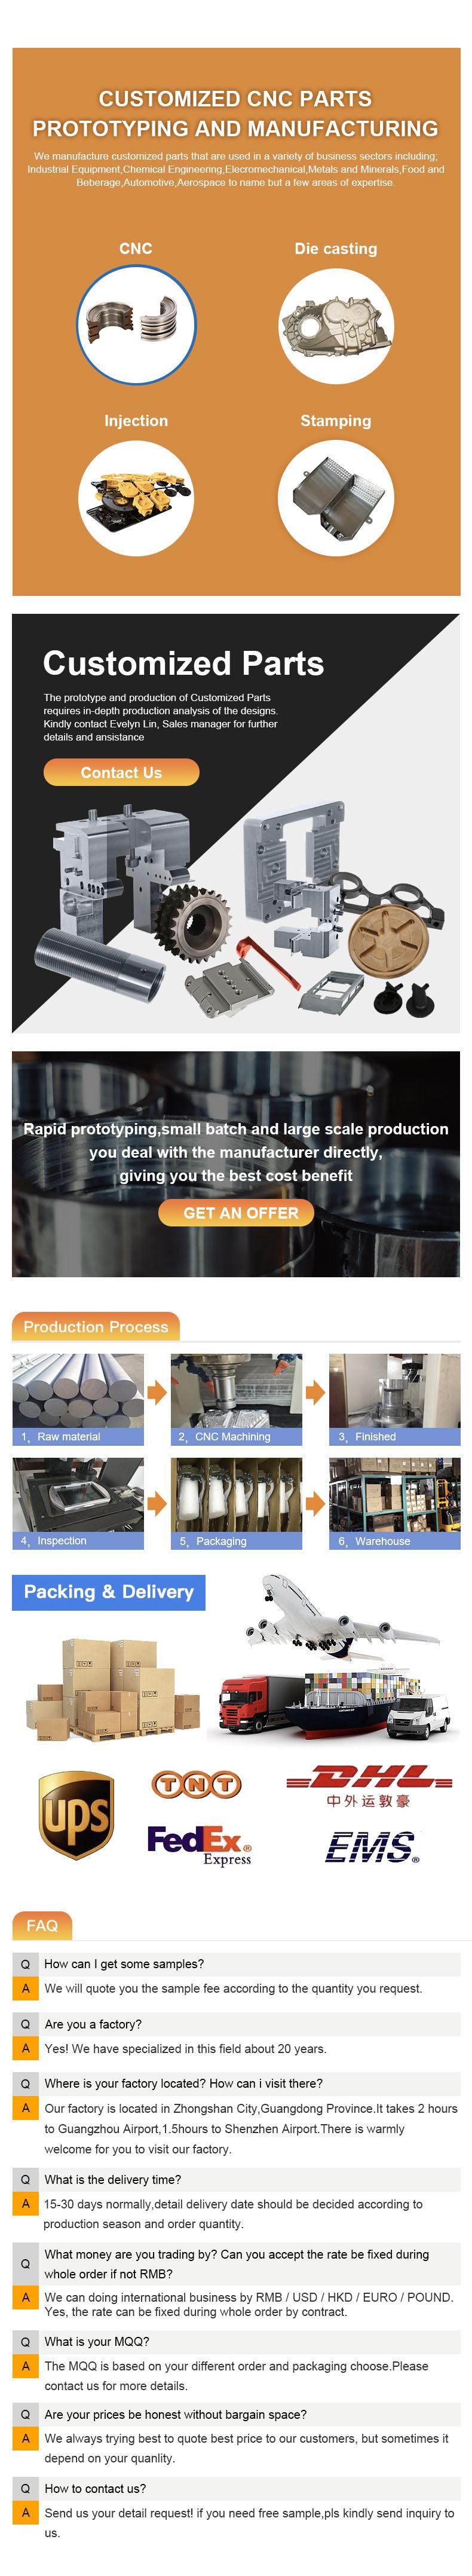 CNC MACHINING PARTS,PRECISION CNC MACHINING PARTS,CNC ALUMINUM PARTS,Machined Products,CNC Machined Products,BoYang Hardware Products,cnc milling machine spare parts